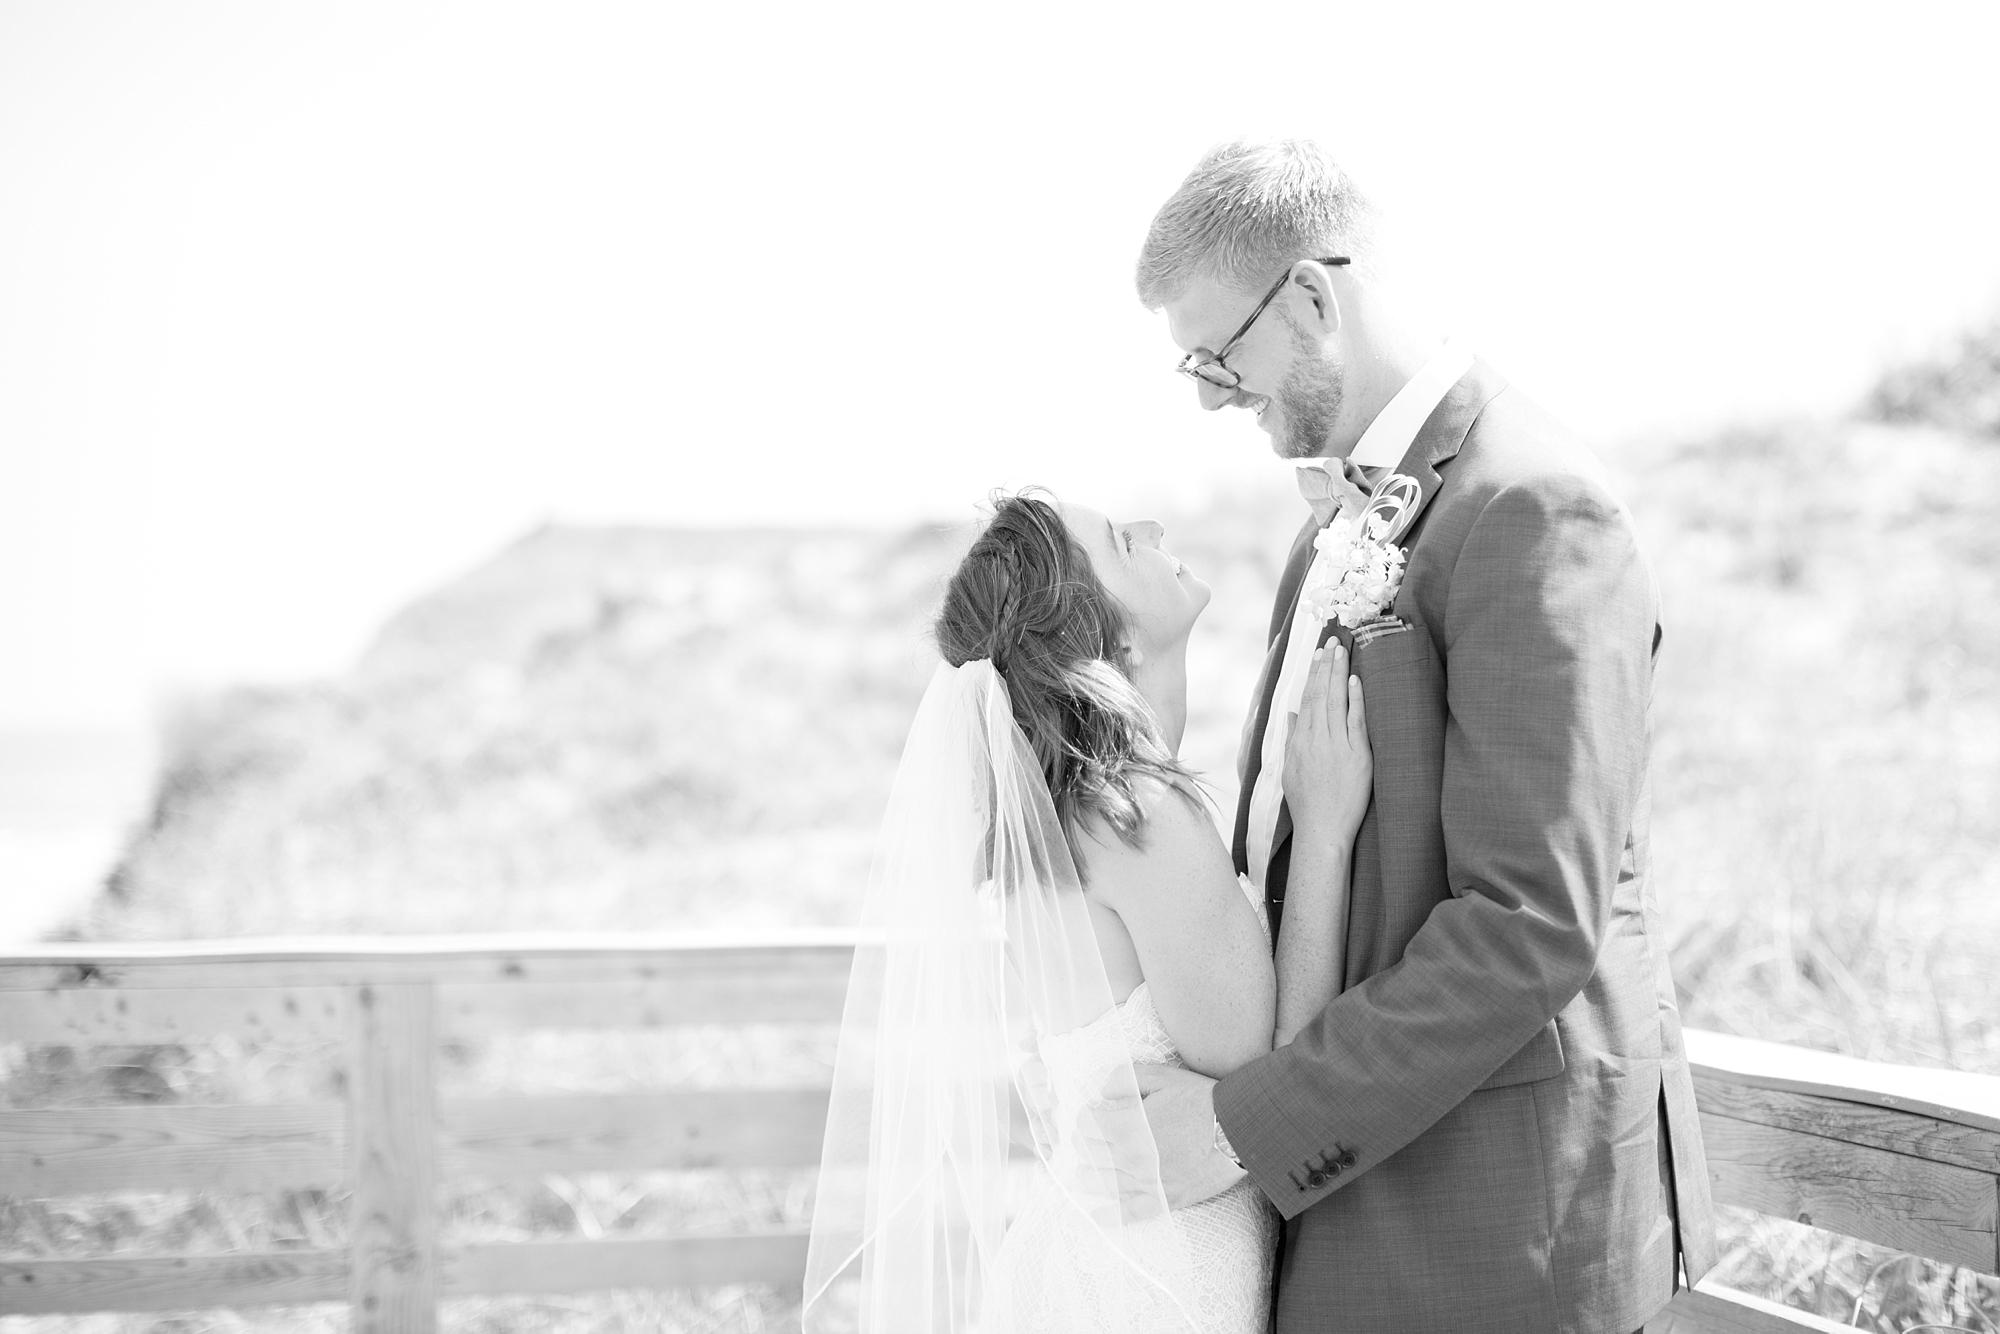 Goodman 3-Bride & Groom Portraits-403_anna grace photography wellfleet cape cod massachusetts destination wedding photographer Chequessett Yacht and Country Club wedding photo.jpg